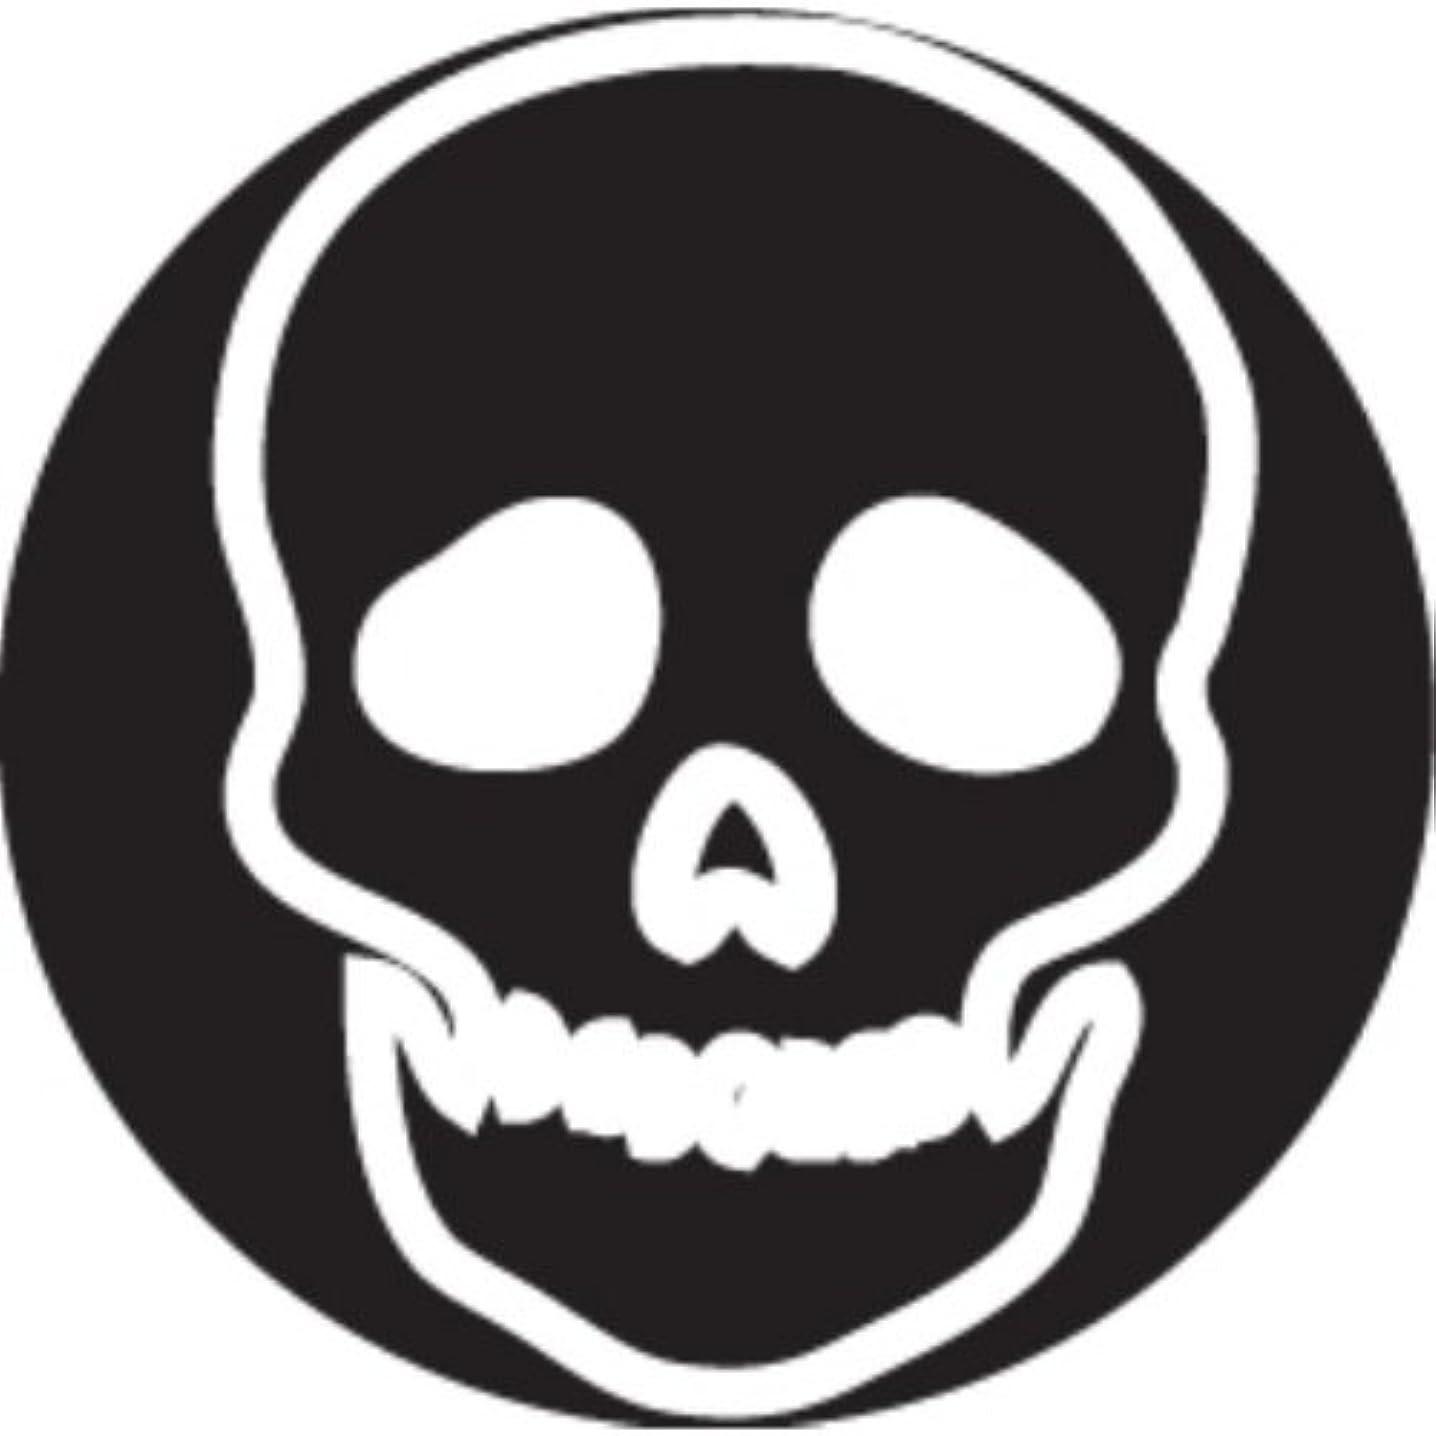 Elite Design Stamp, Skull   PUN-203.27